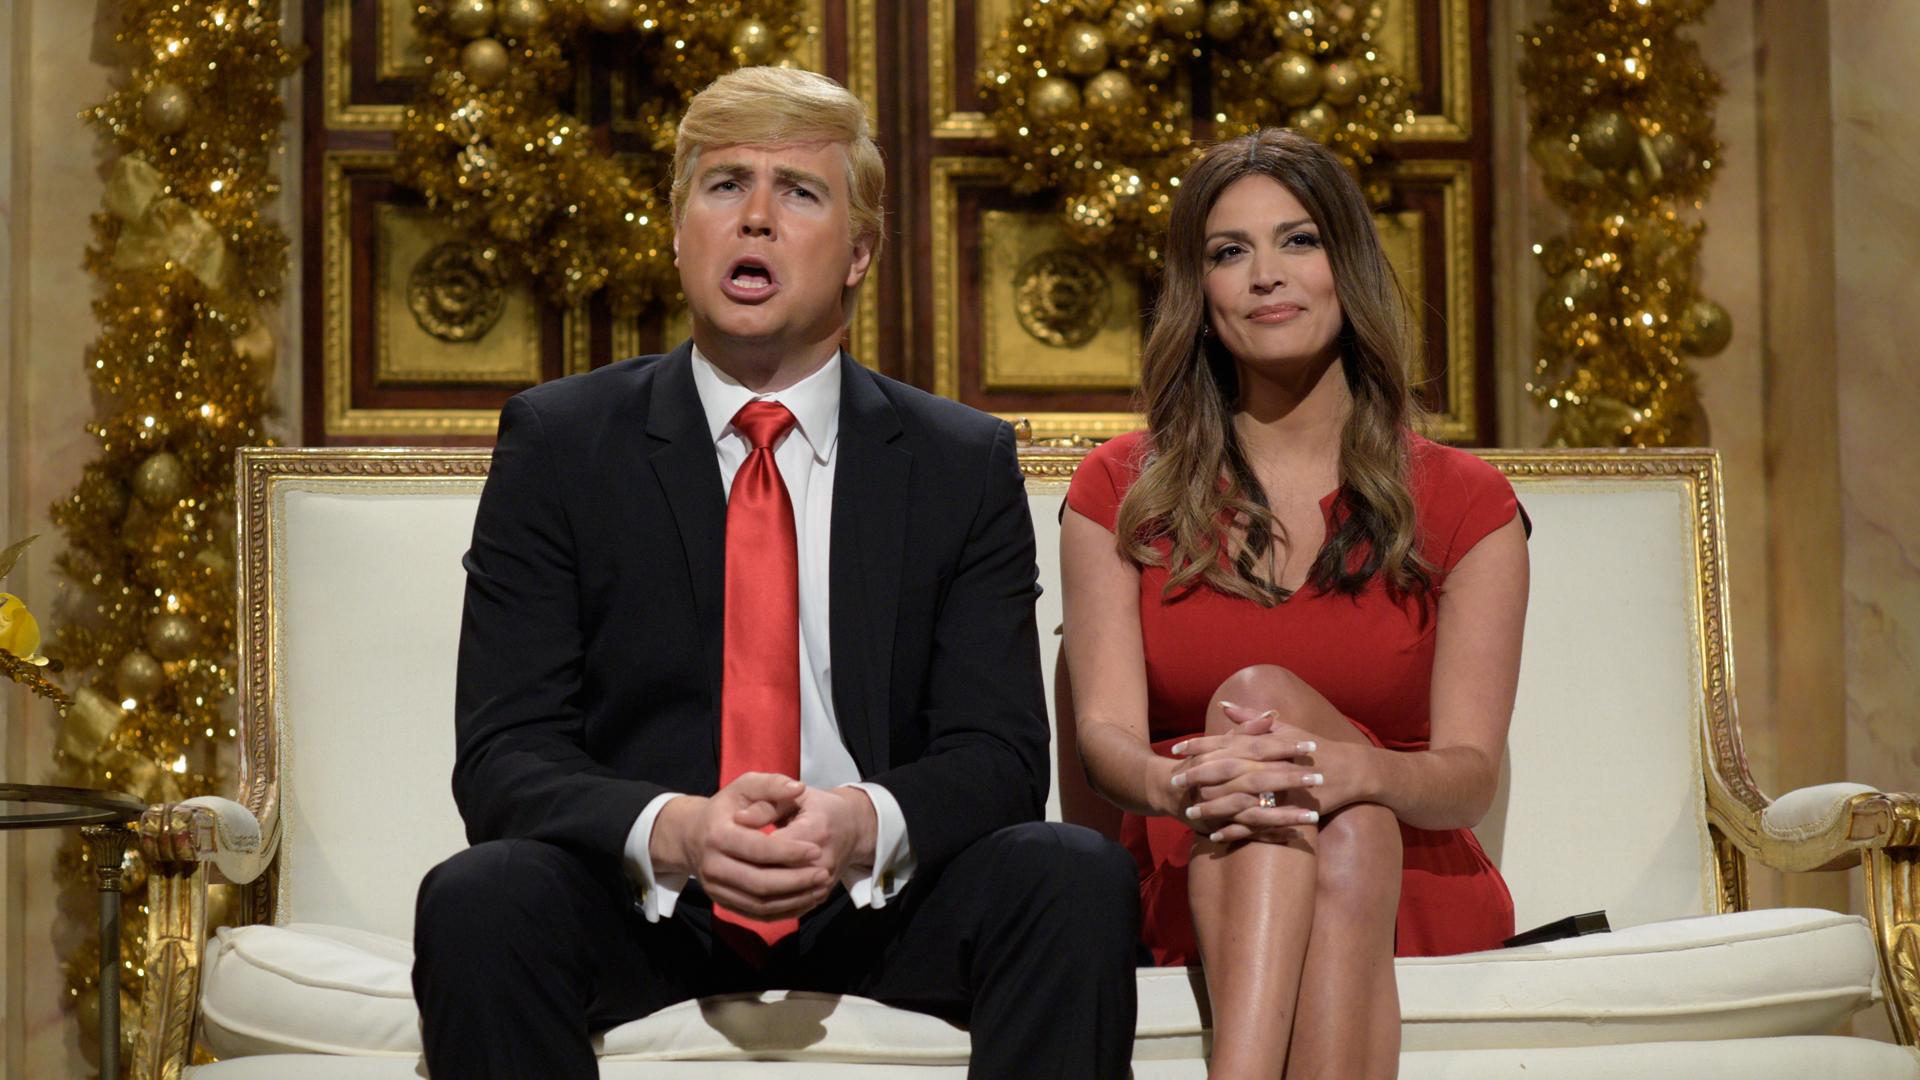 watch saturday night live highlight donald and melania trump christmas cold open nbccom - Saturday Night Live Christmas Song